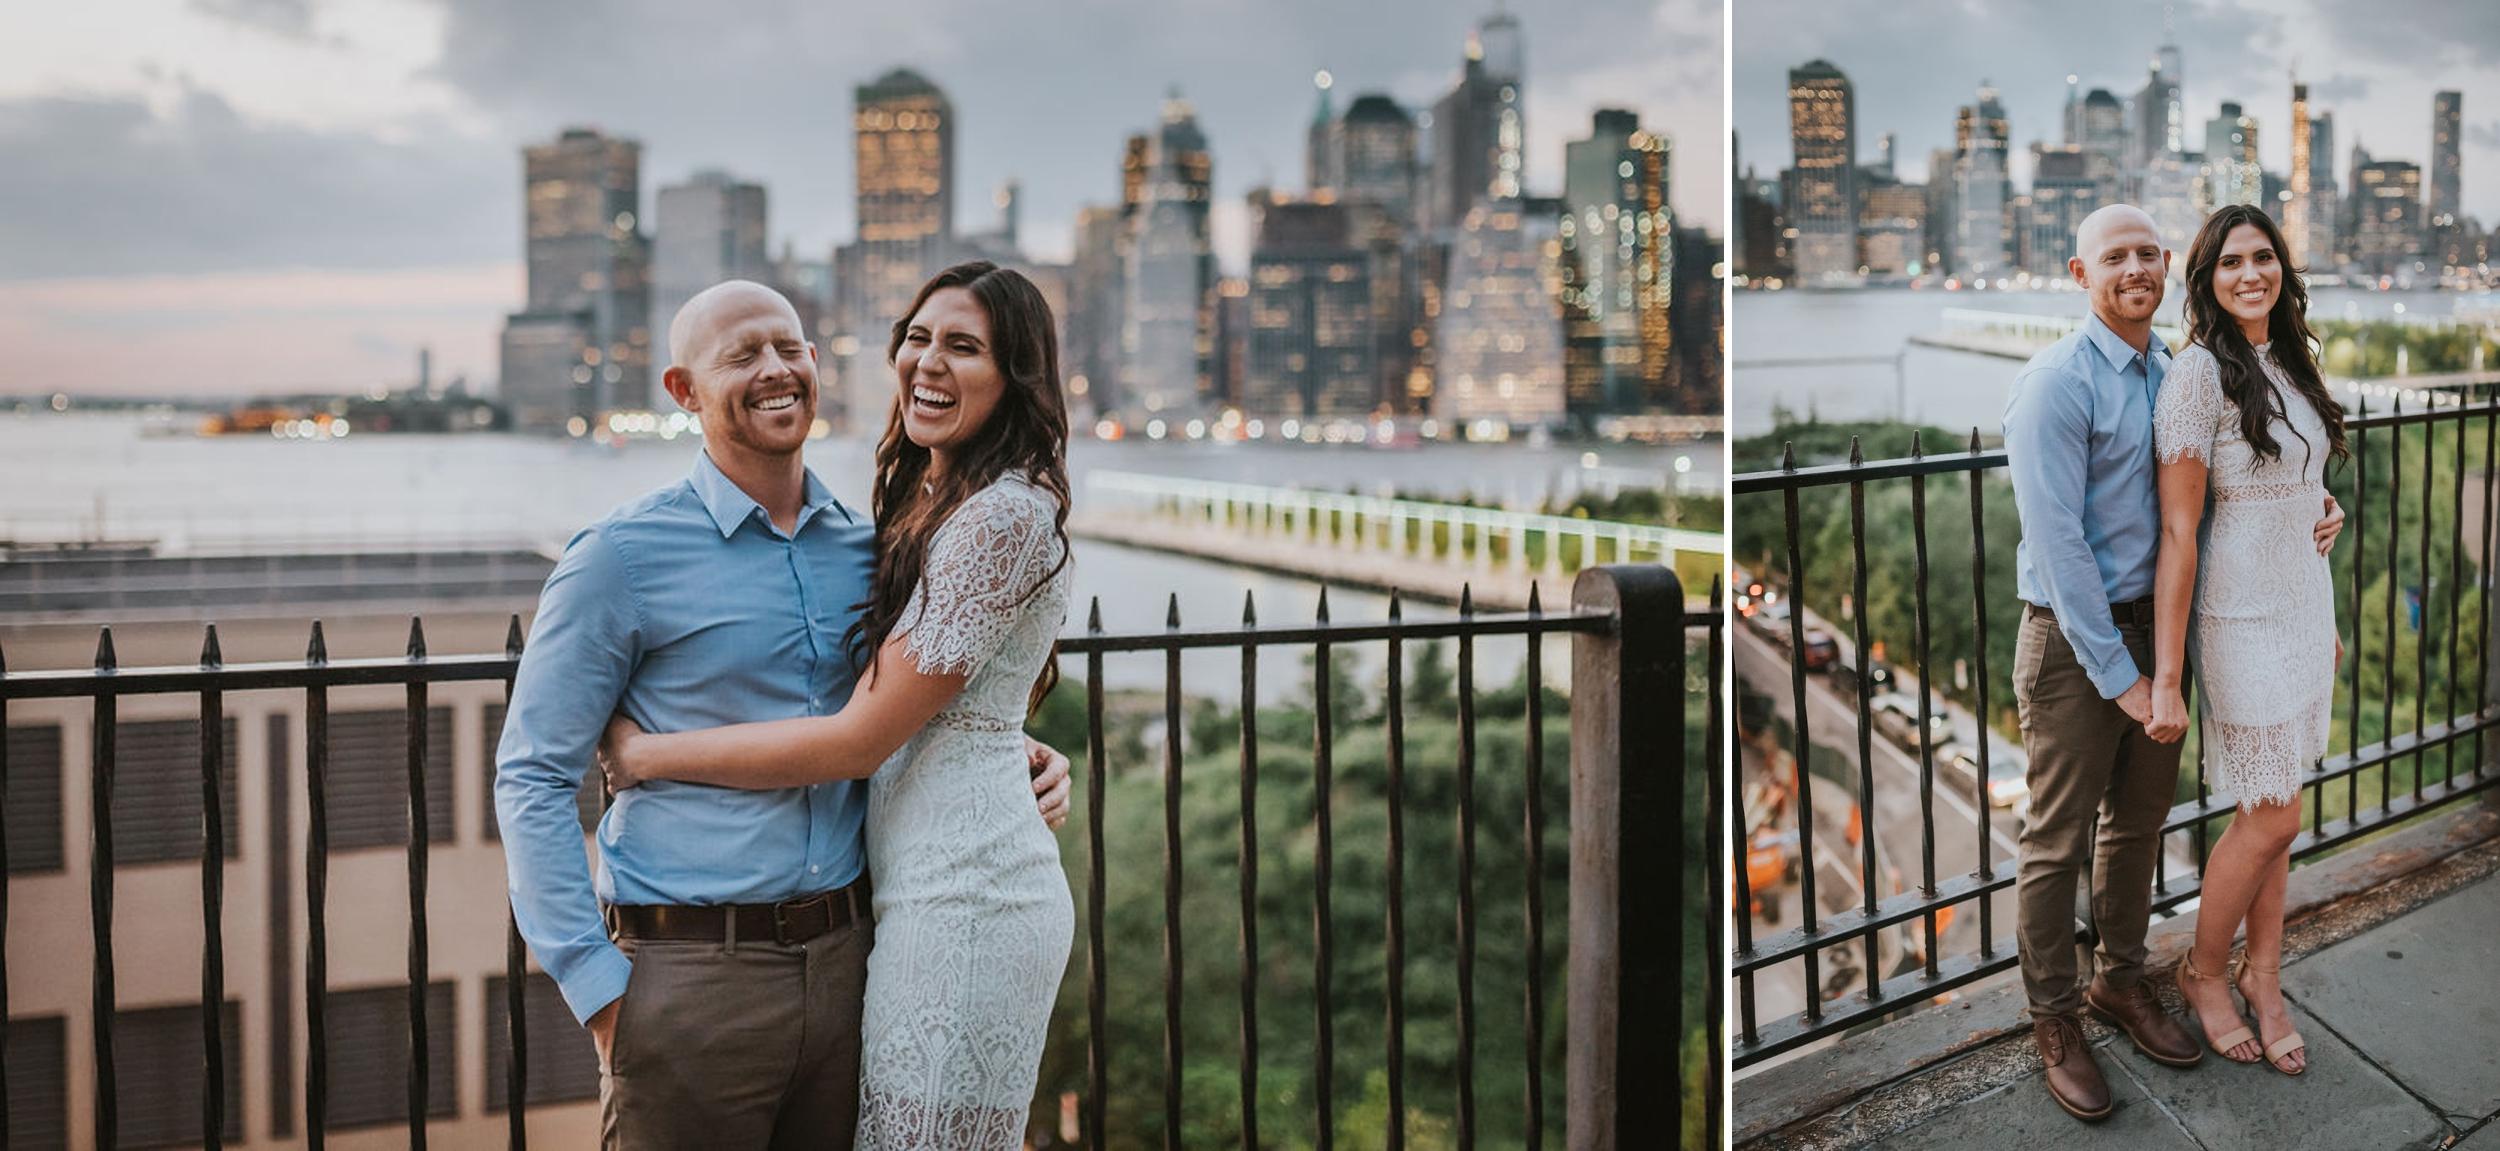 Bianca & Matt NYC Brooklyn Bridge Park LIU Engagement 09.jpg